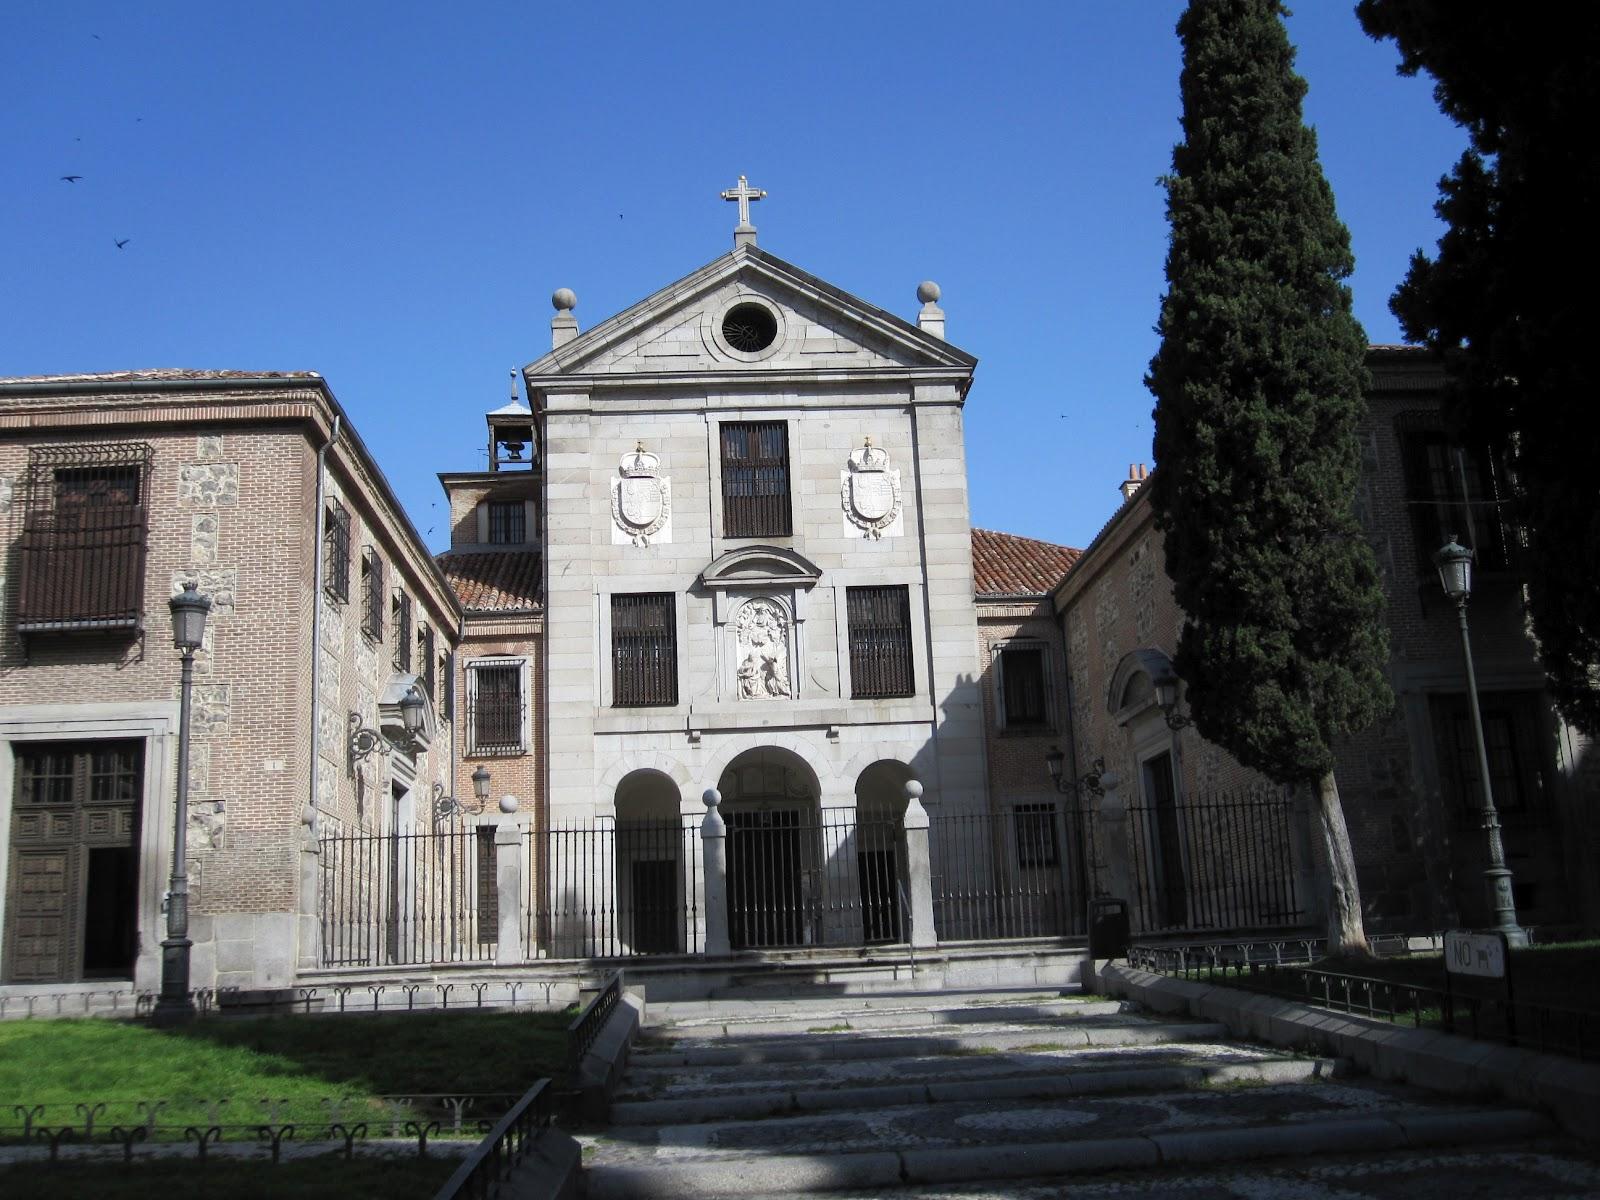 Guide: Real Monasterio de San Lorenzo de El Escorial 2004 Spain/España